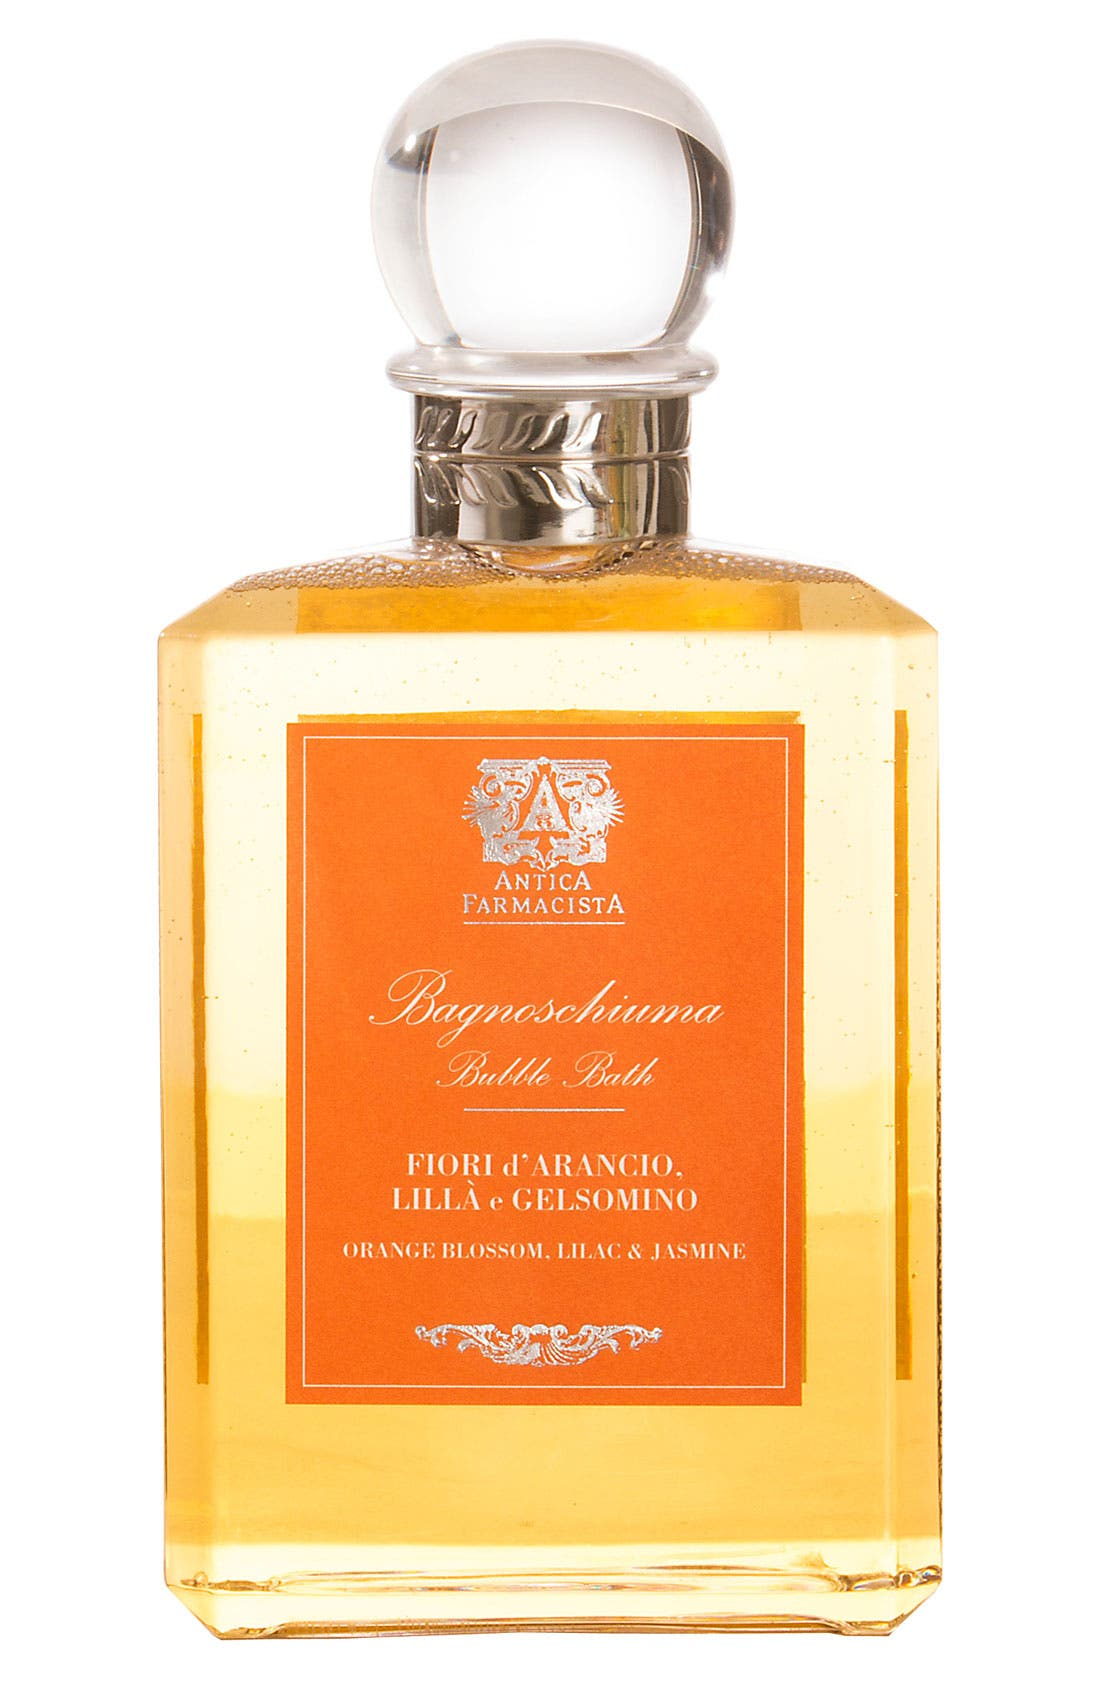 'Orange Blossom, Lilac & Jasmine' Bubble Bath,                             Main thumbnail 1, color,                             NO COLOR